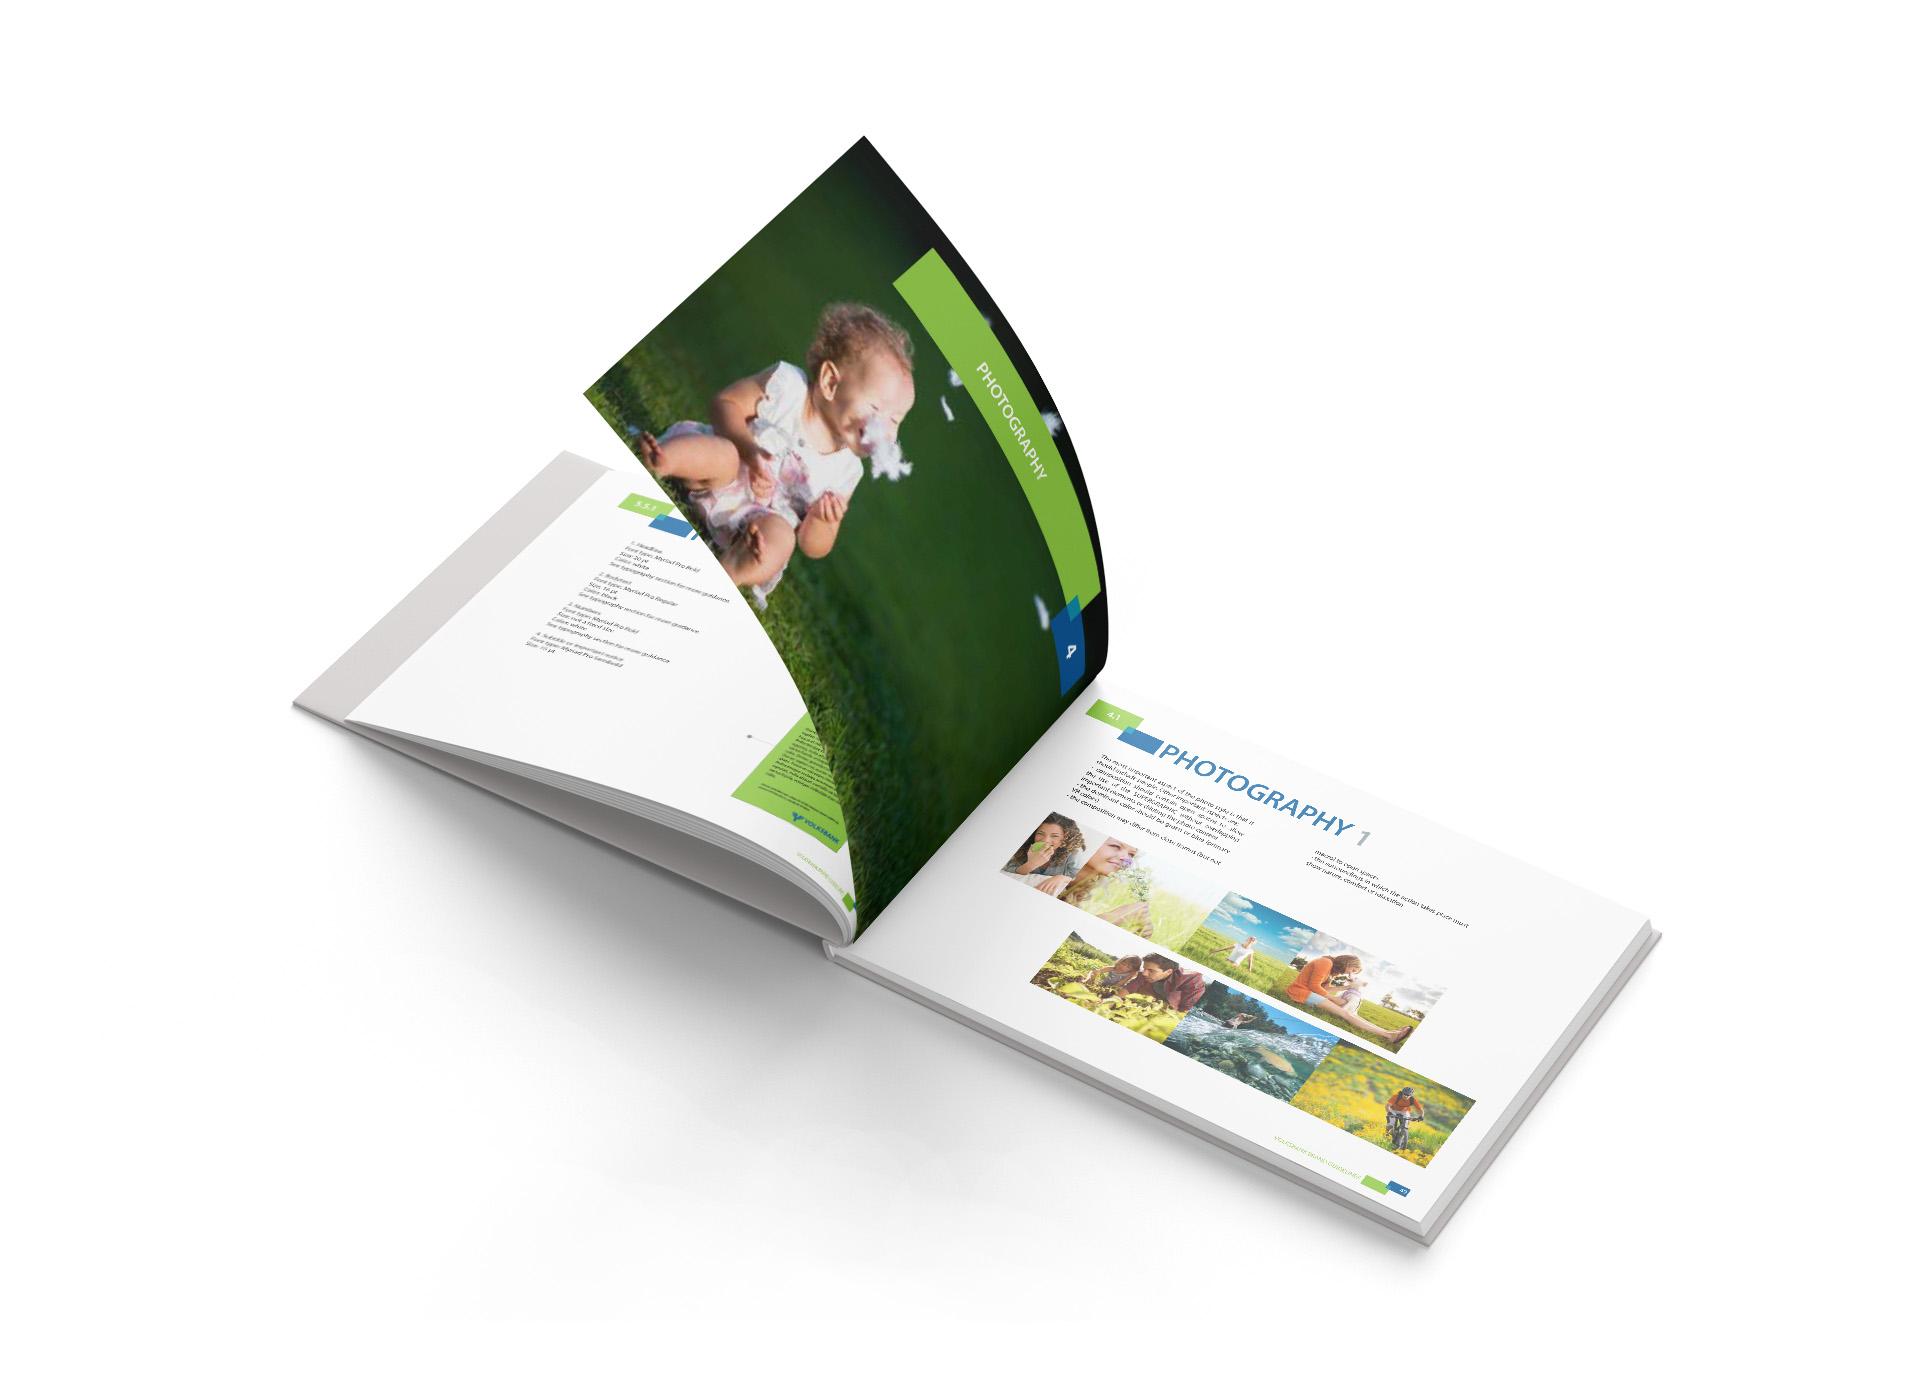 volksbank brand book portofoliu inoveo